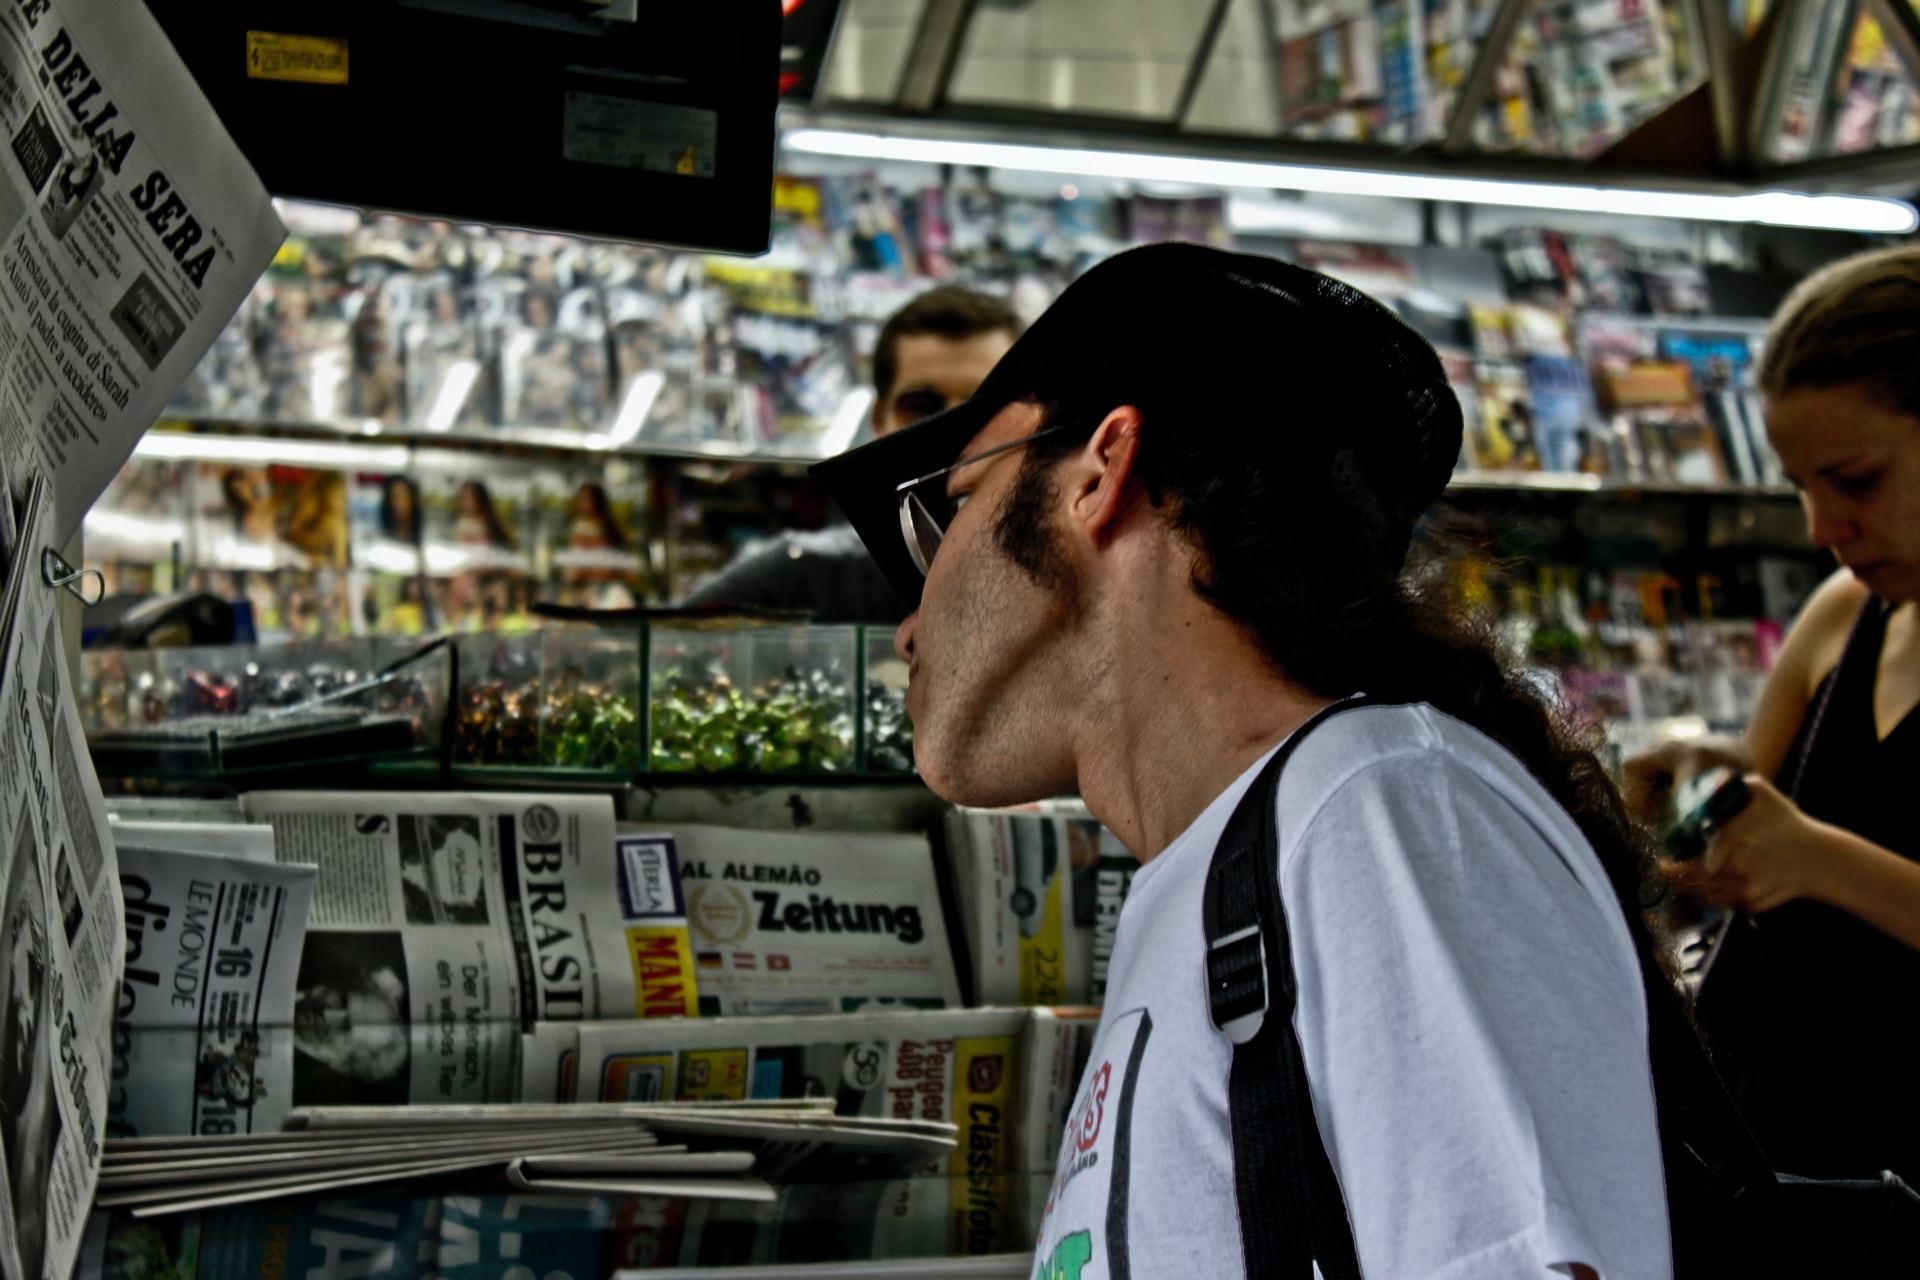 Burlesco derruba os paywalls dos maiores jornais do Brasil